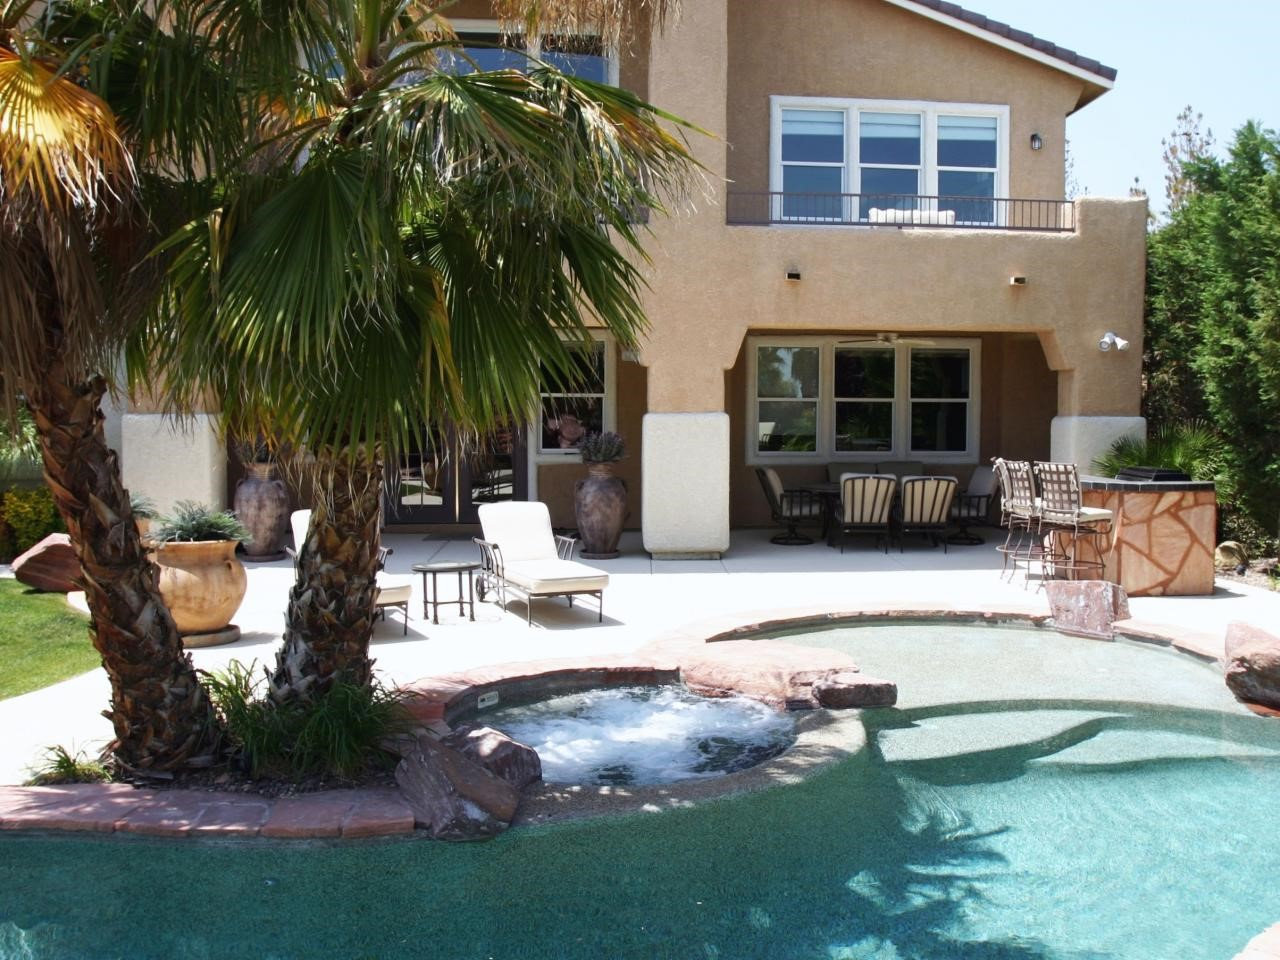 Pool & Spa Checklist